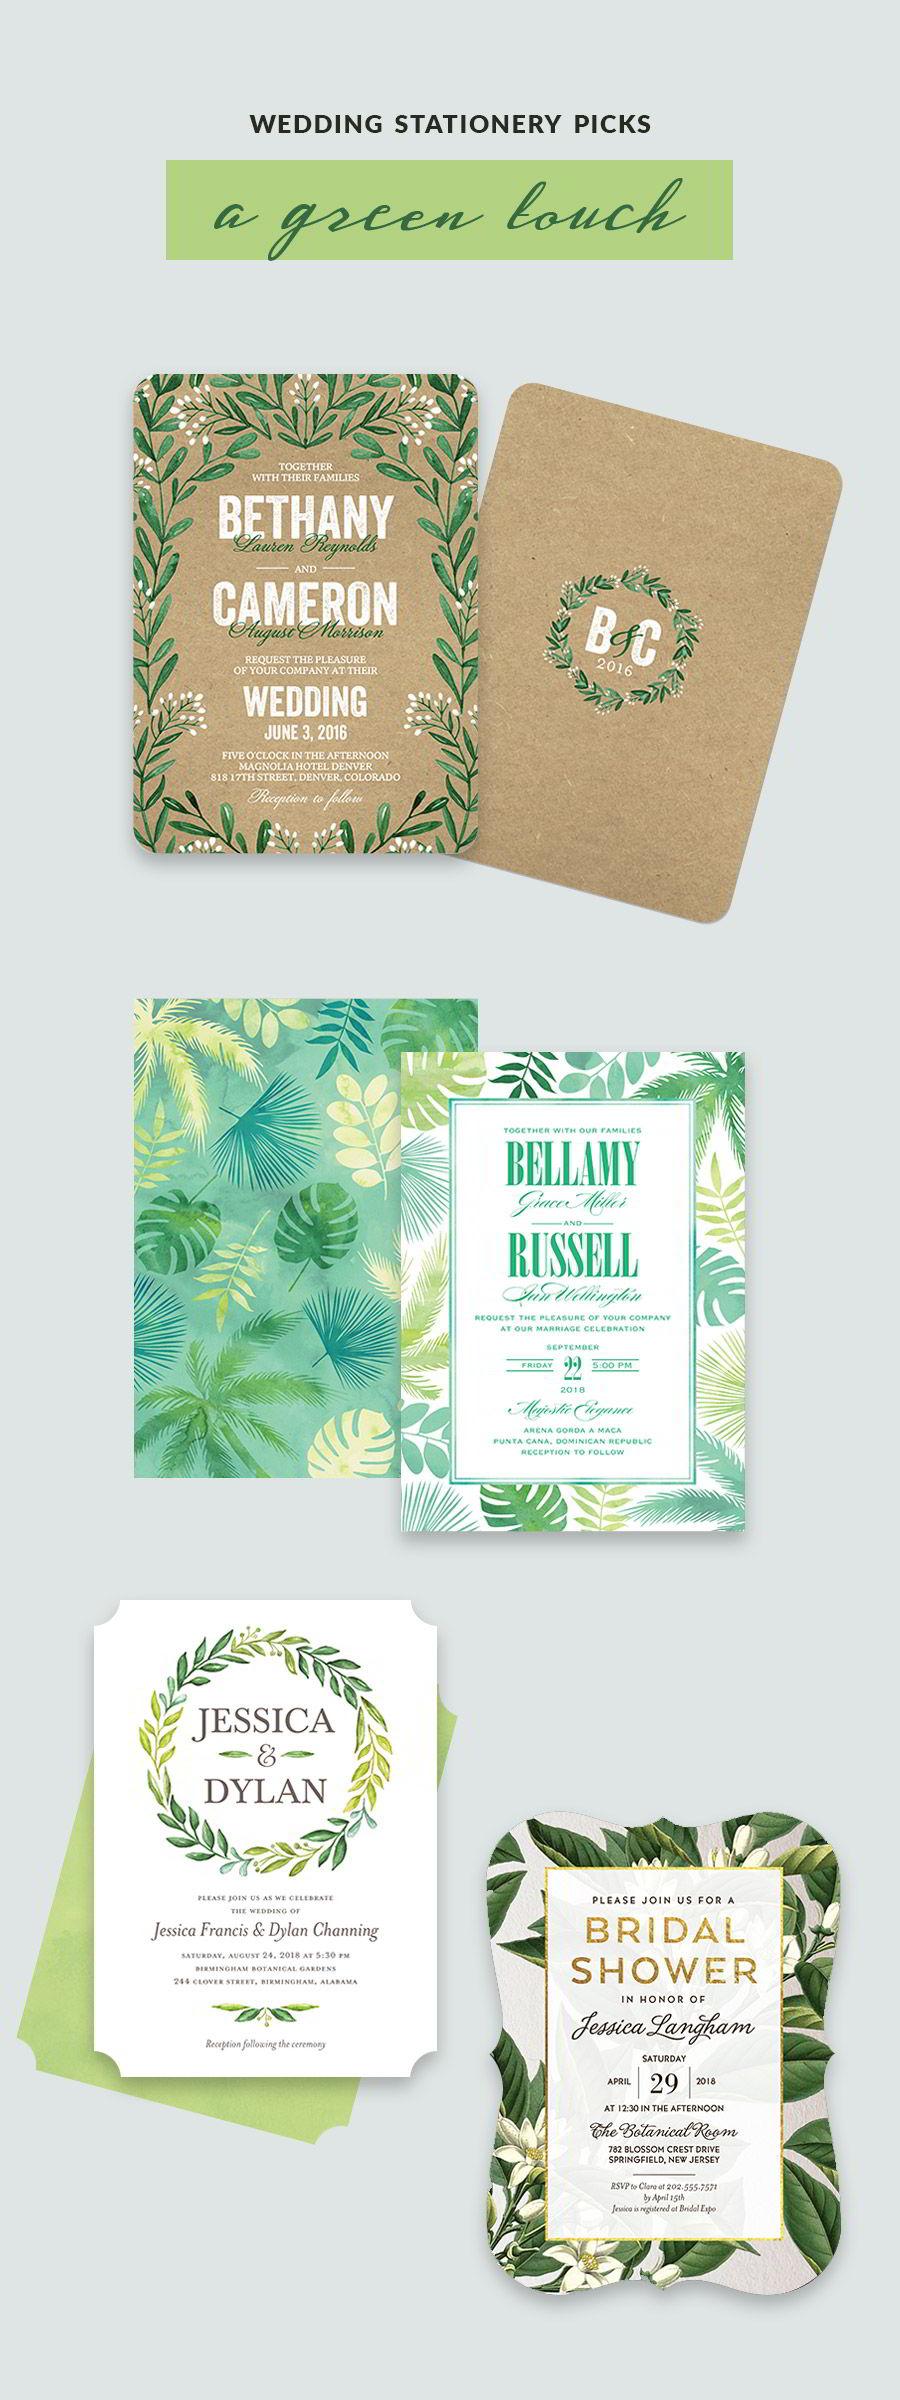 shutterfly bridal stationery green kraft wedding invitation cards color inspiration